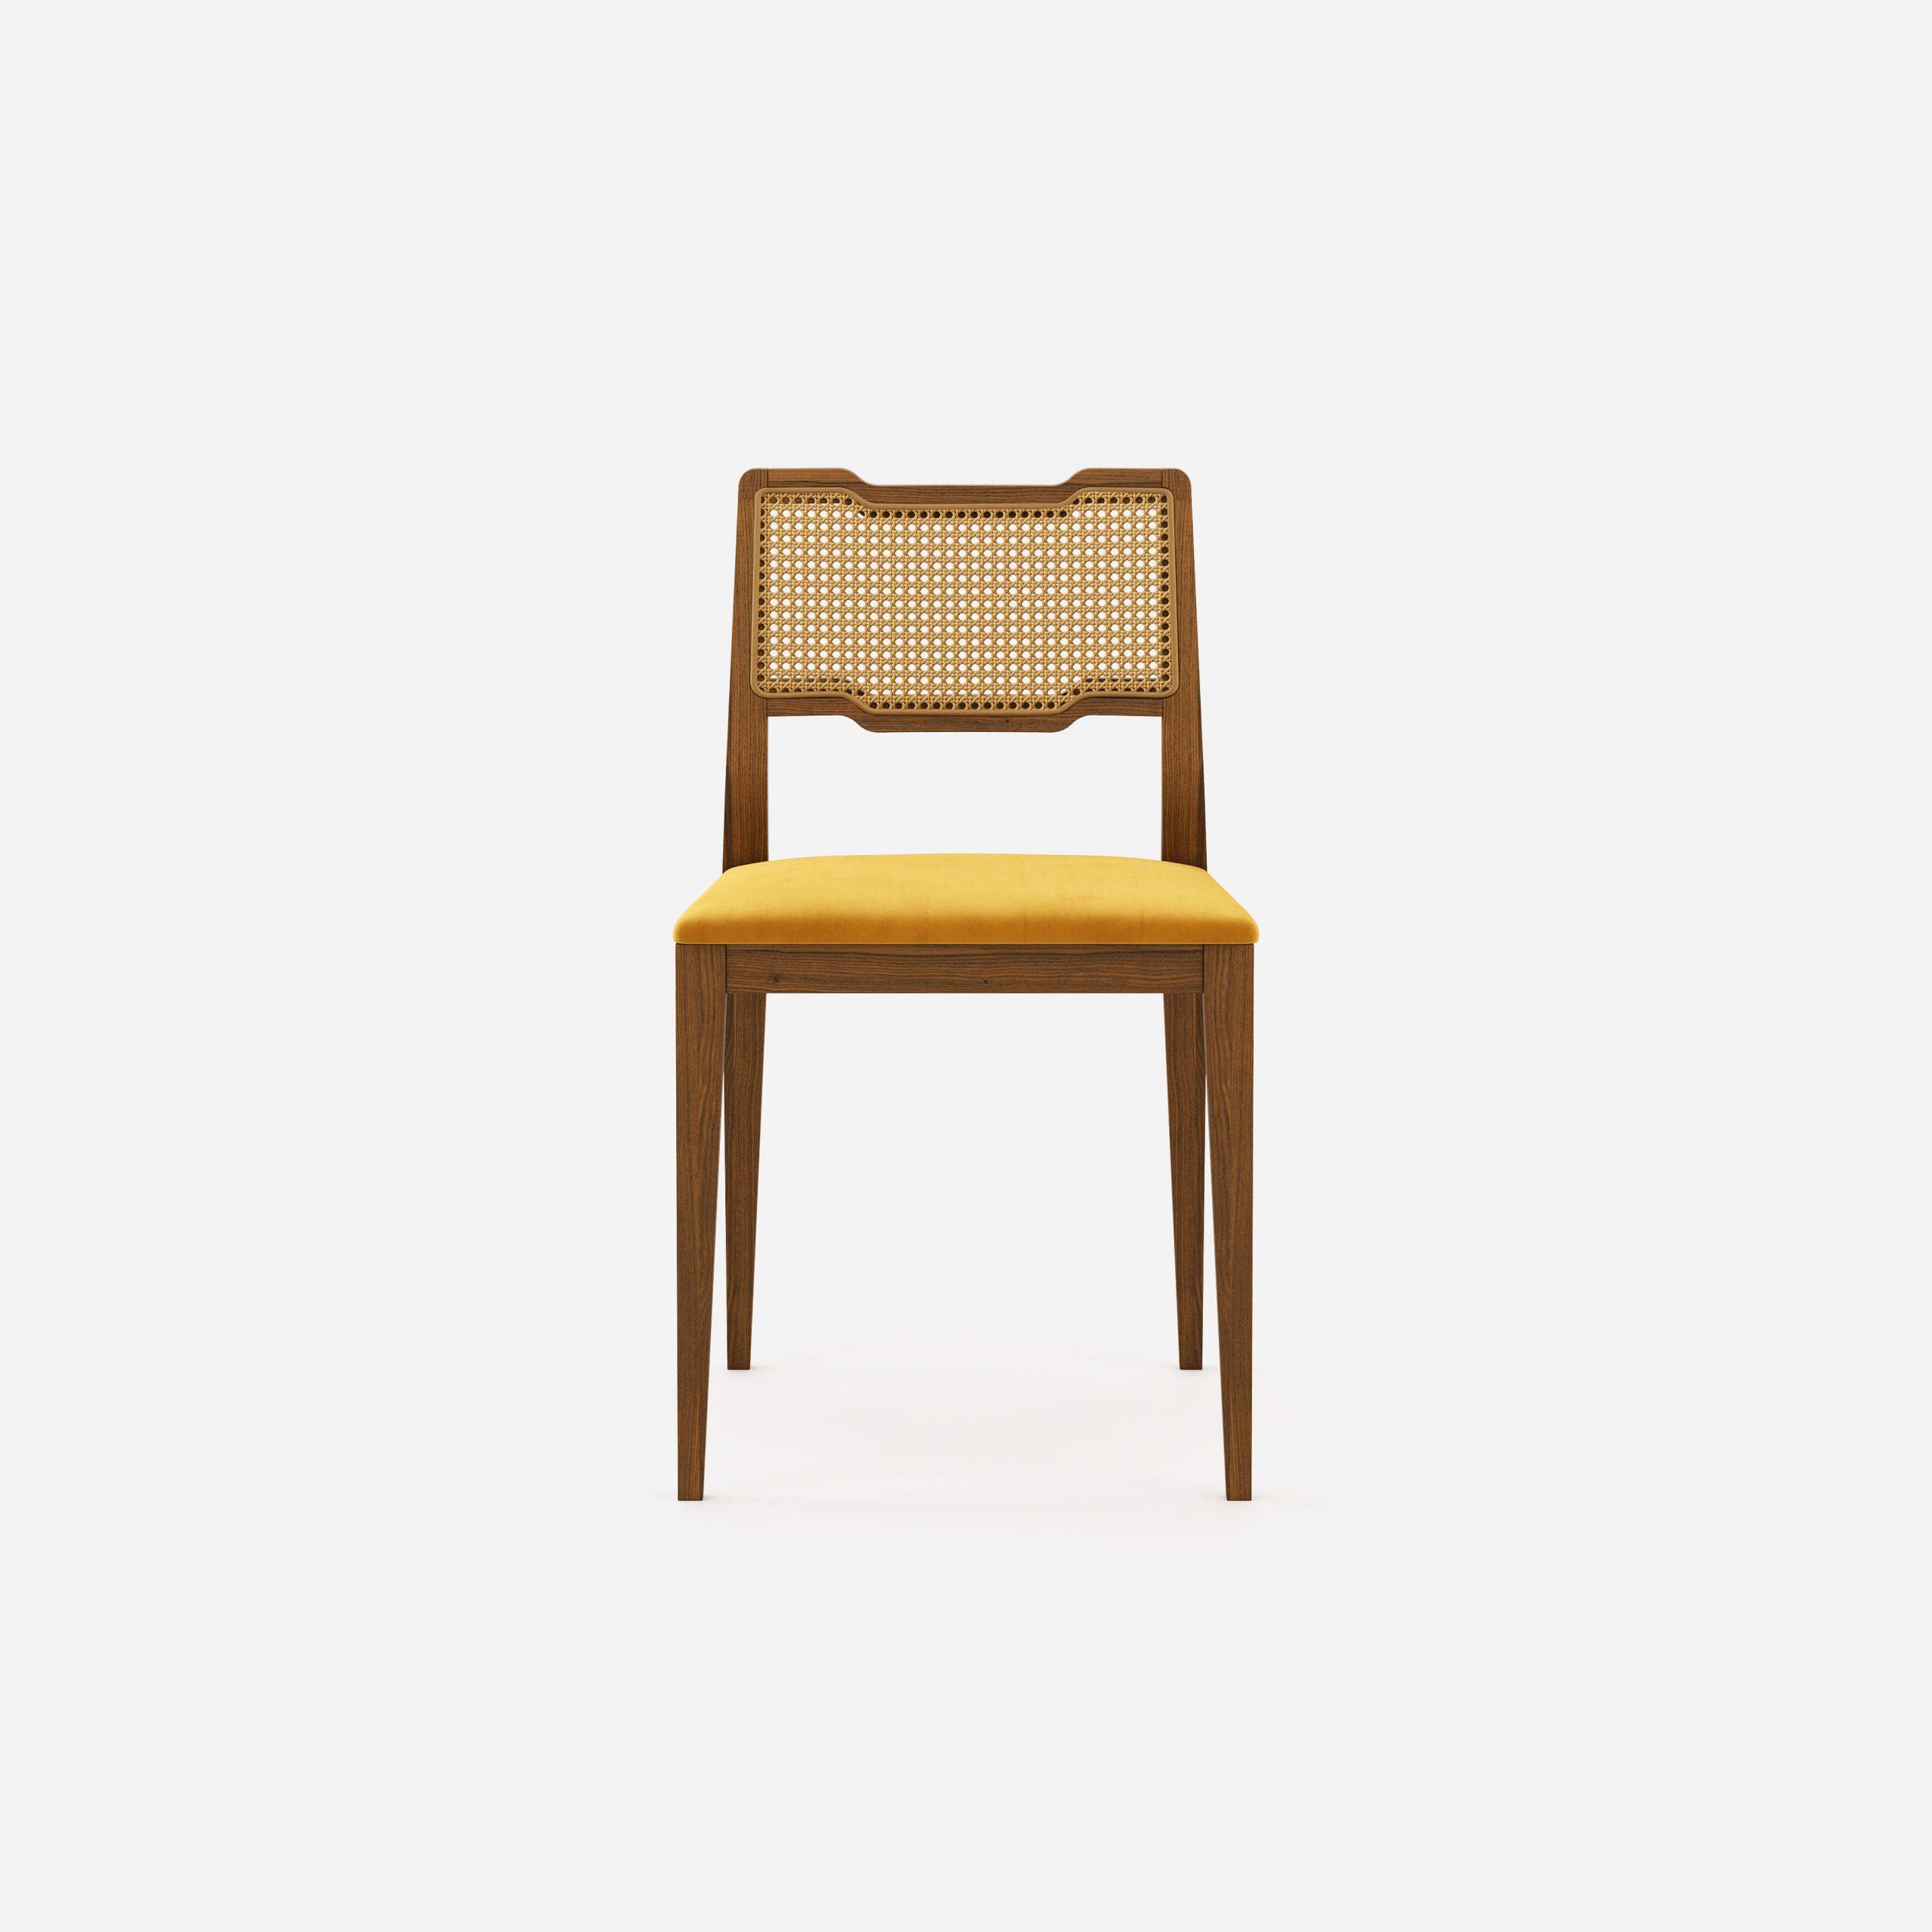 eva-chair-dining-room-domkapa-4